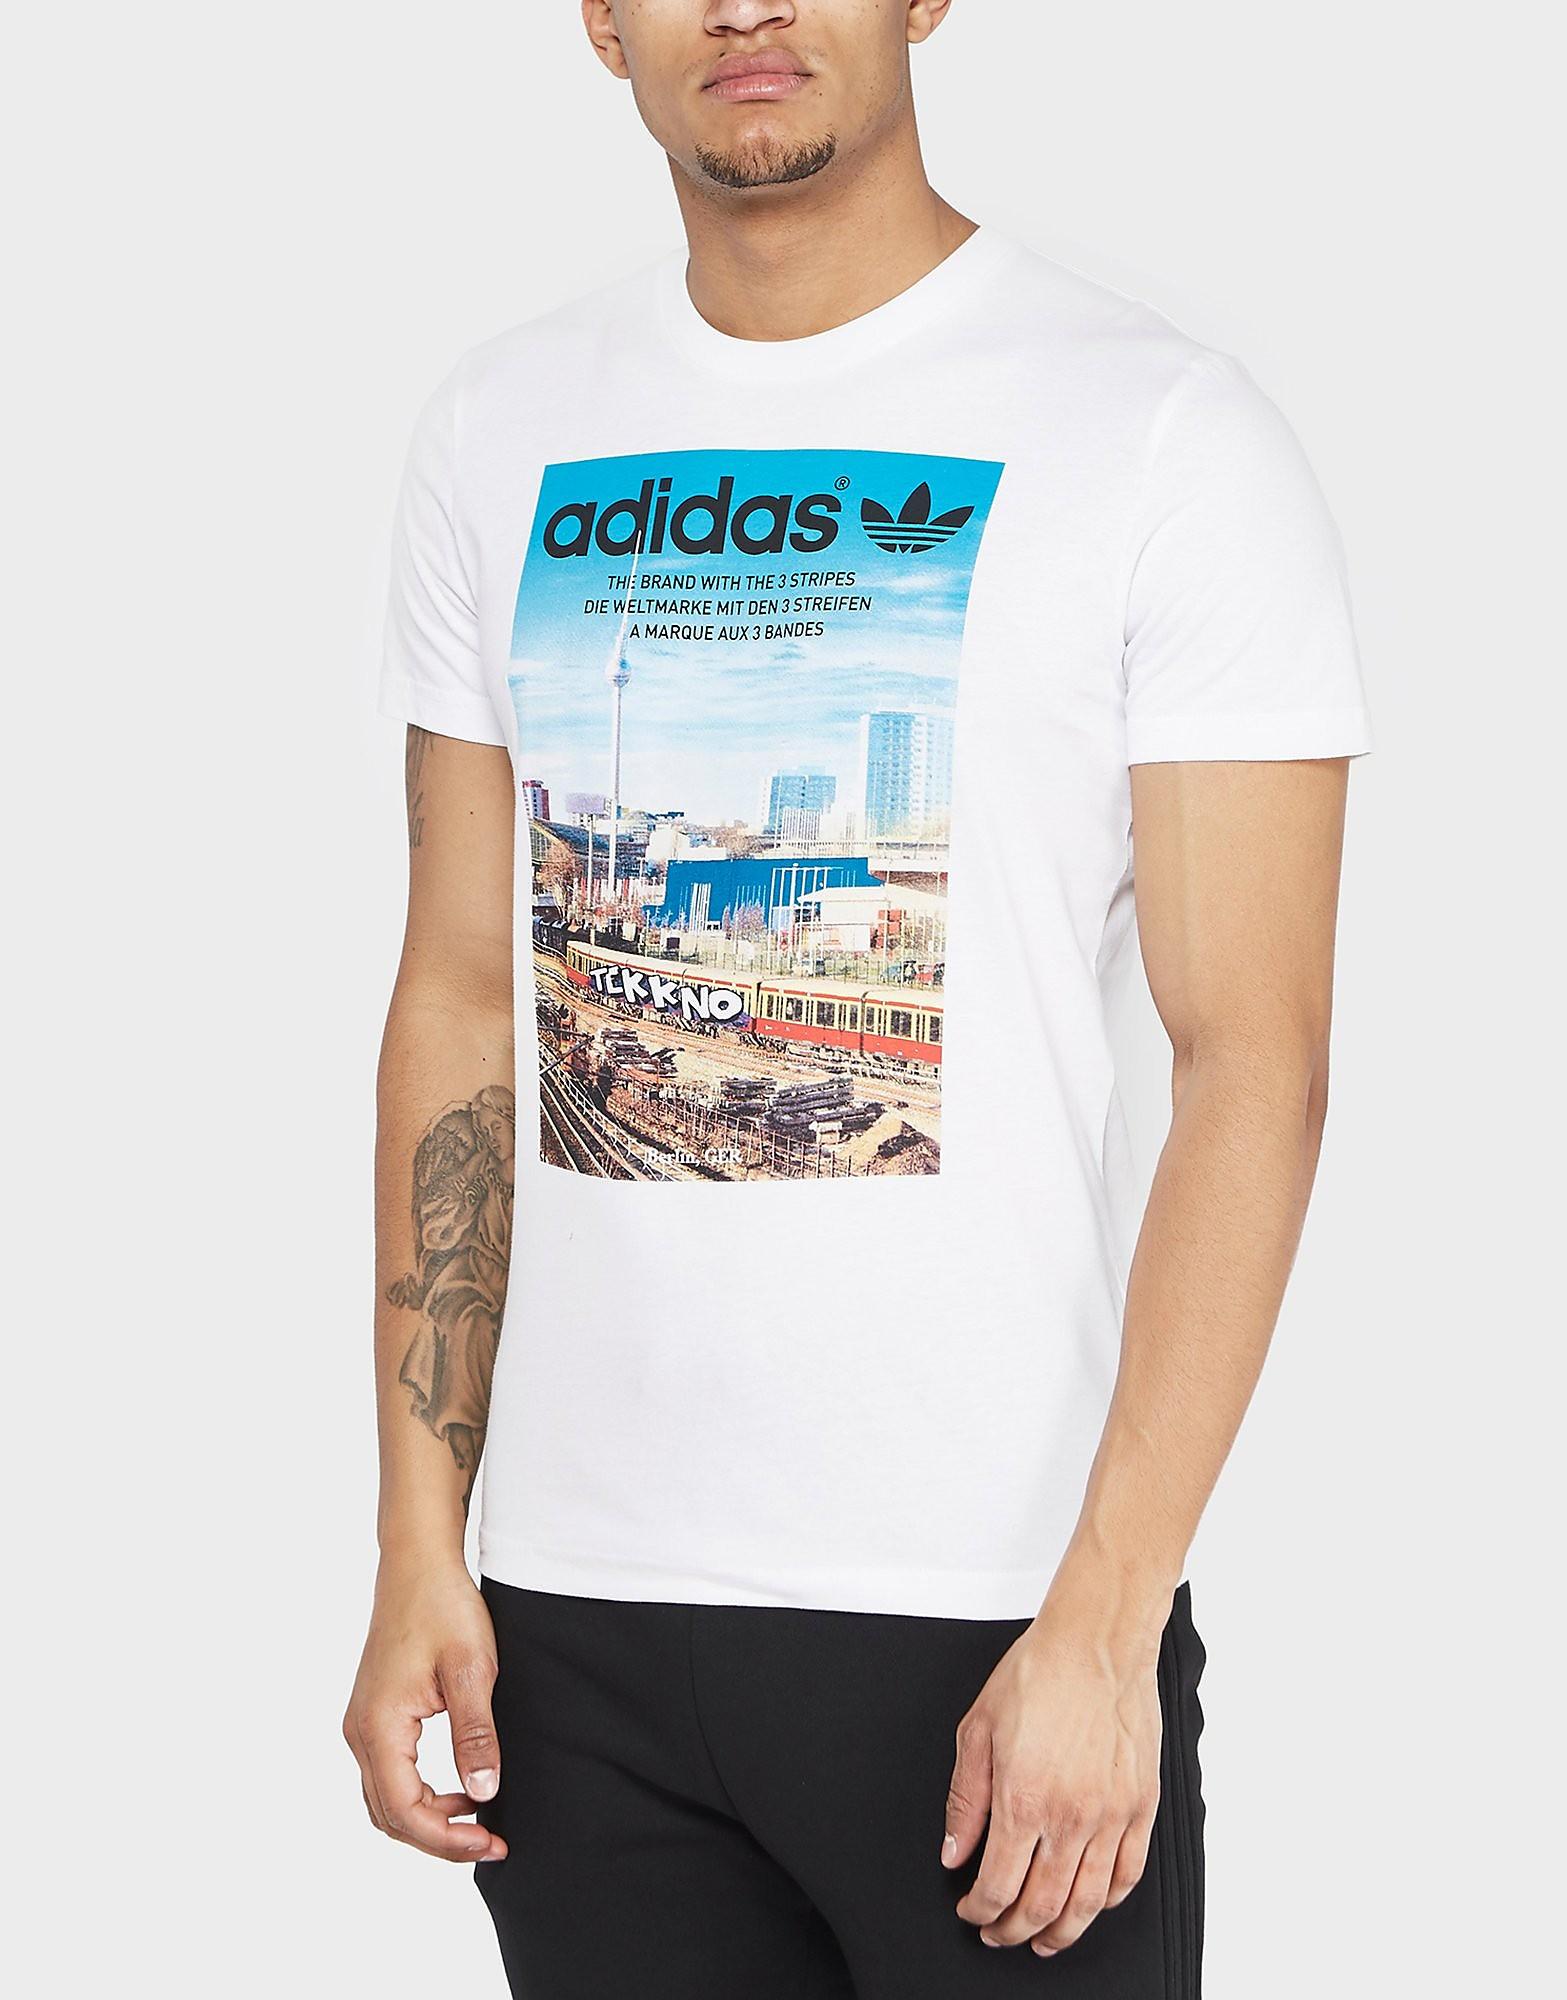 adidas Originals Berlin City T-Shirt